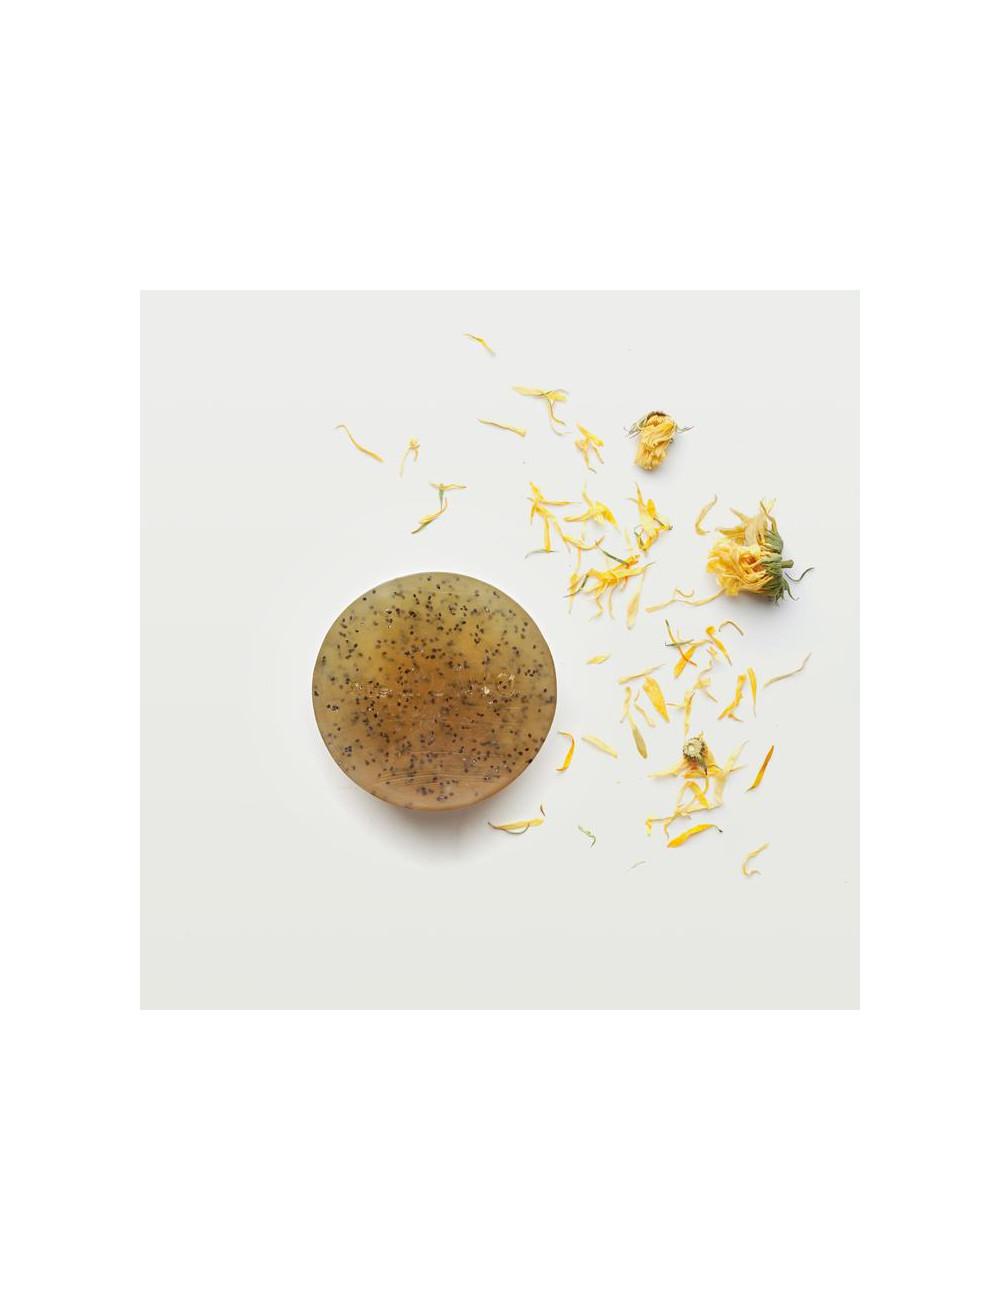 Savon exfoliant - Marigold the Munio